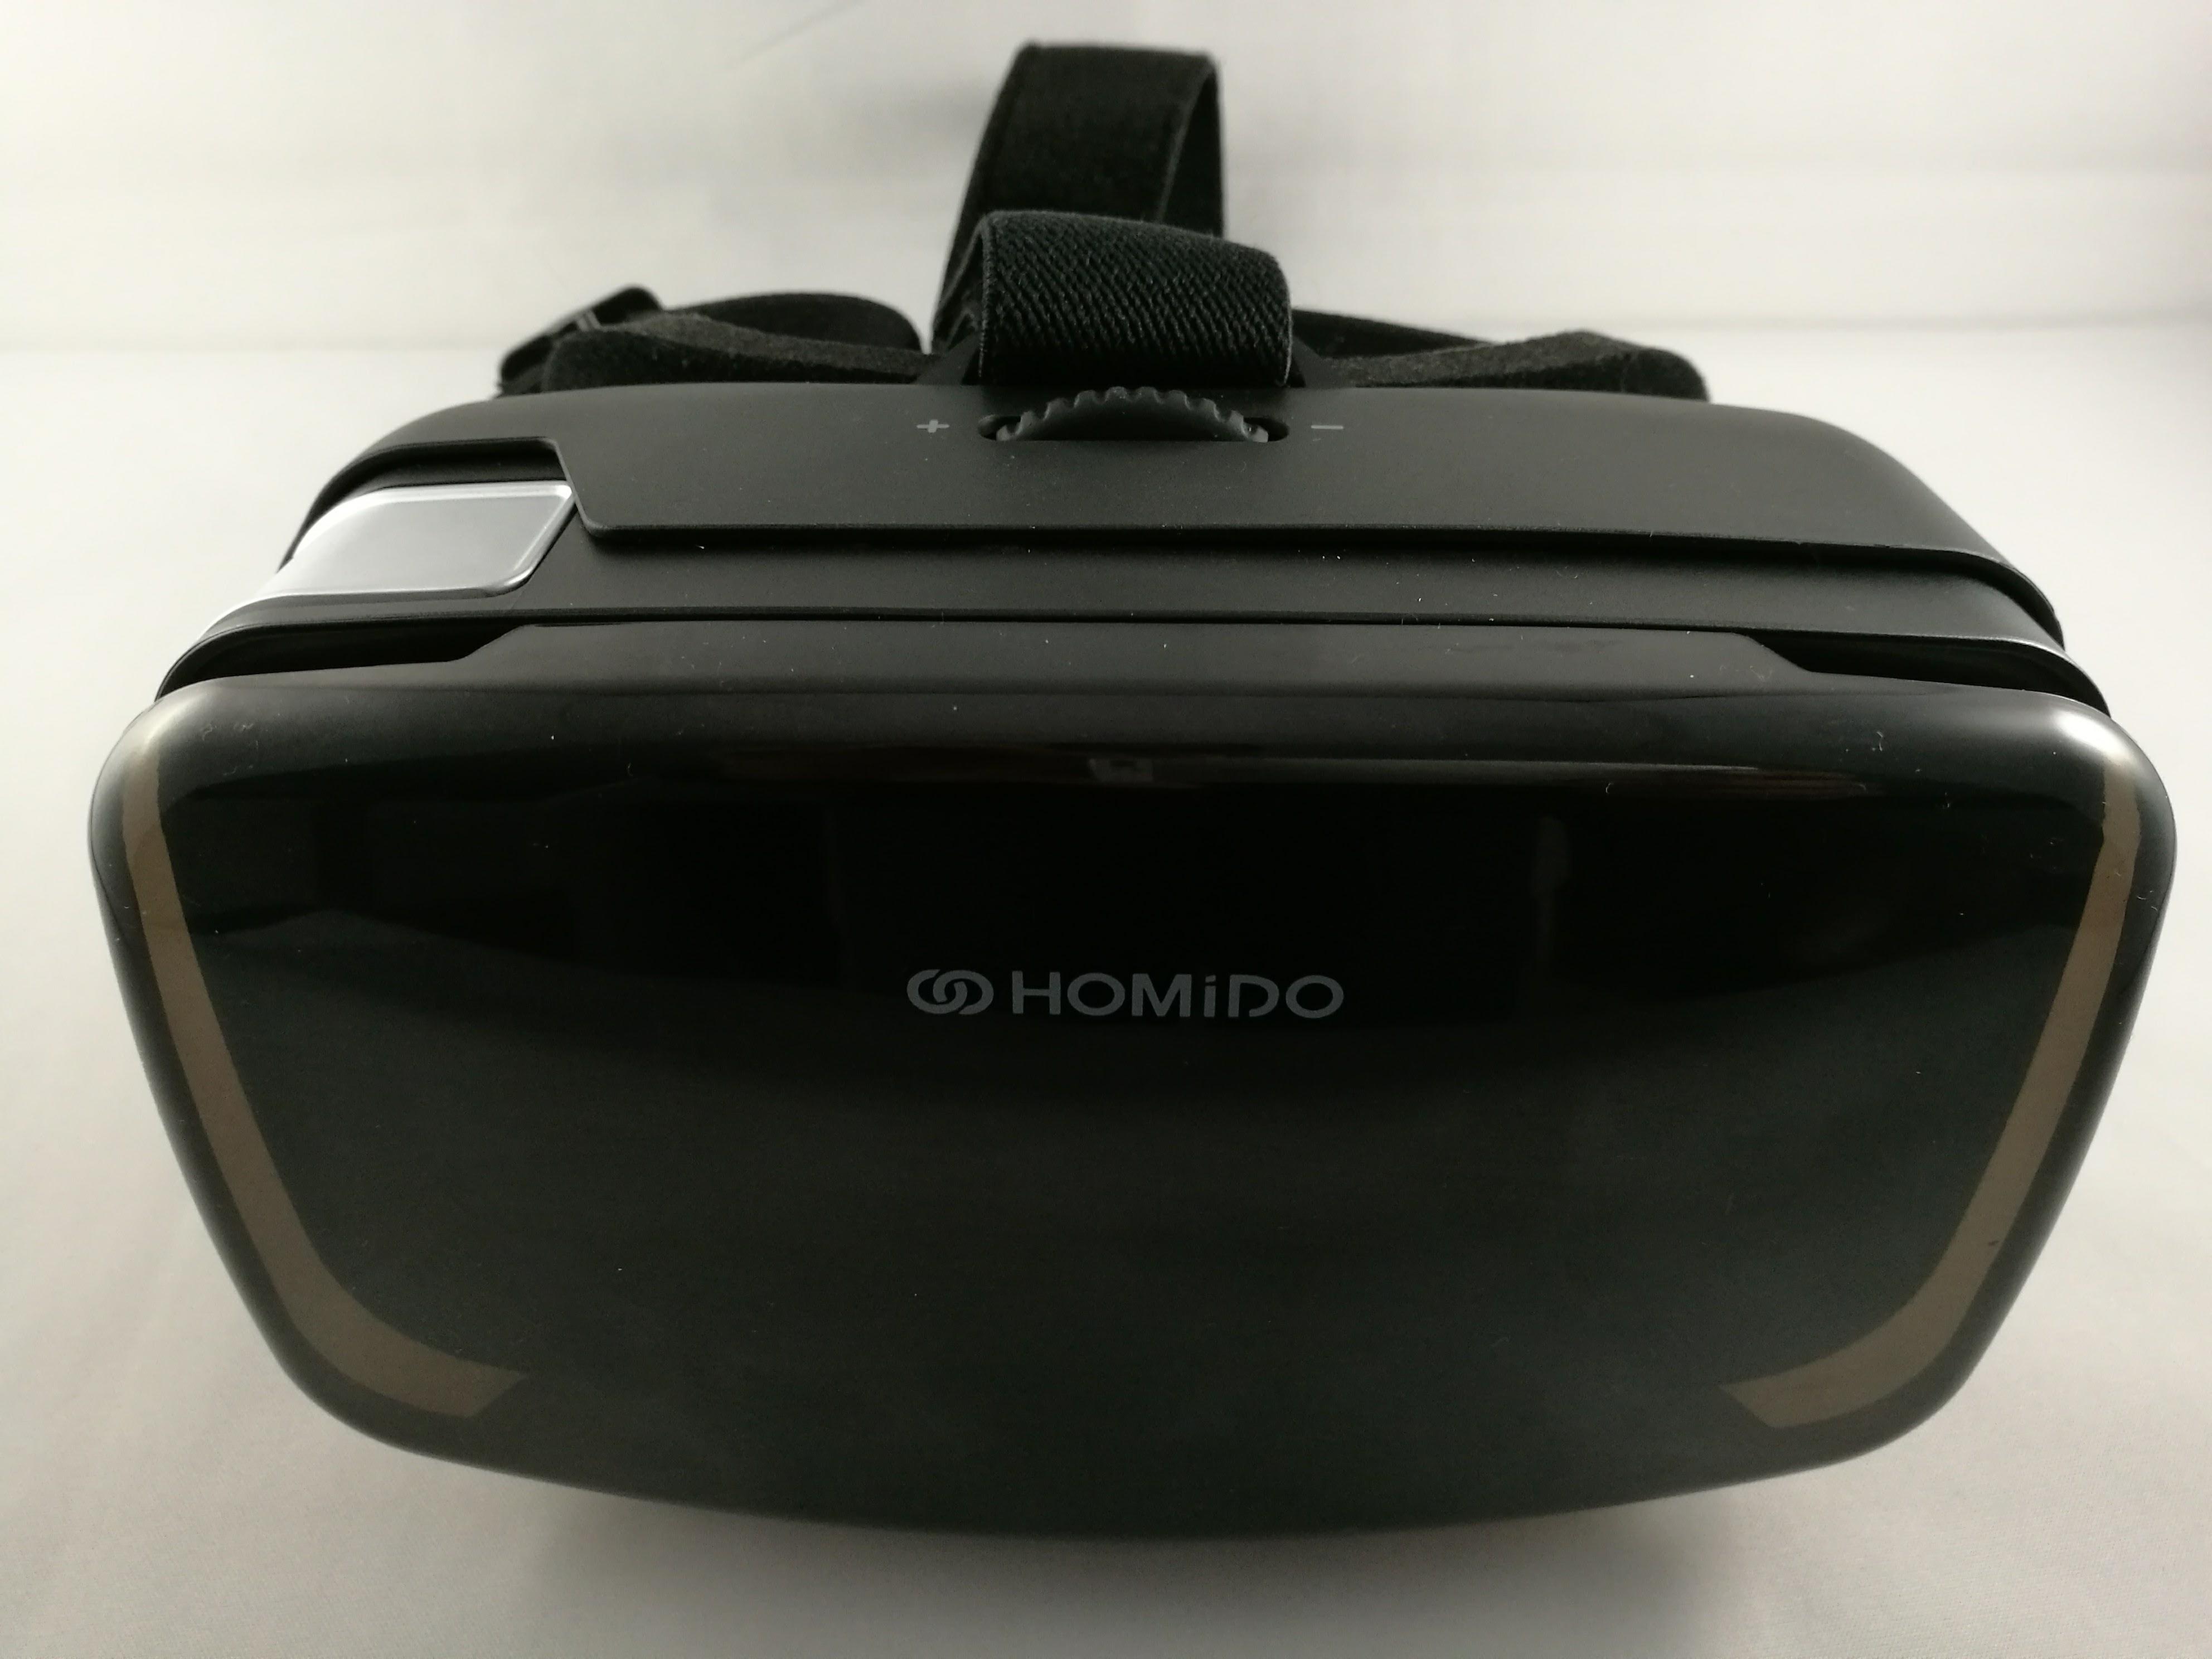 Homido V2 : notre test & avis sur le casque VR français